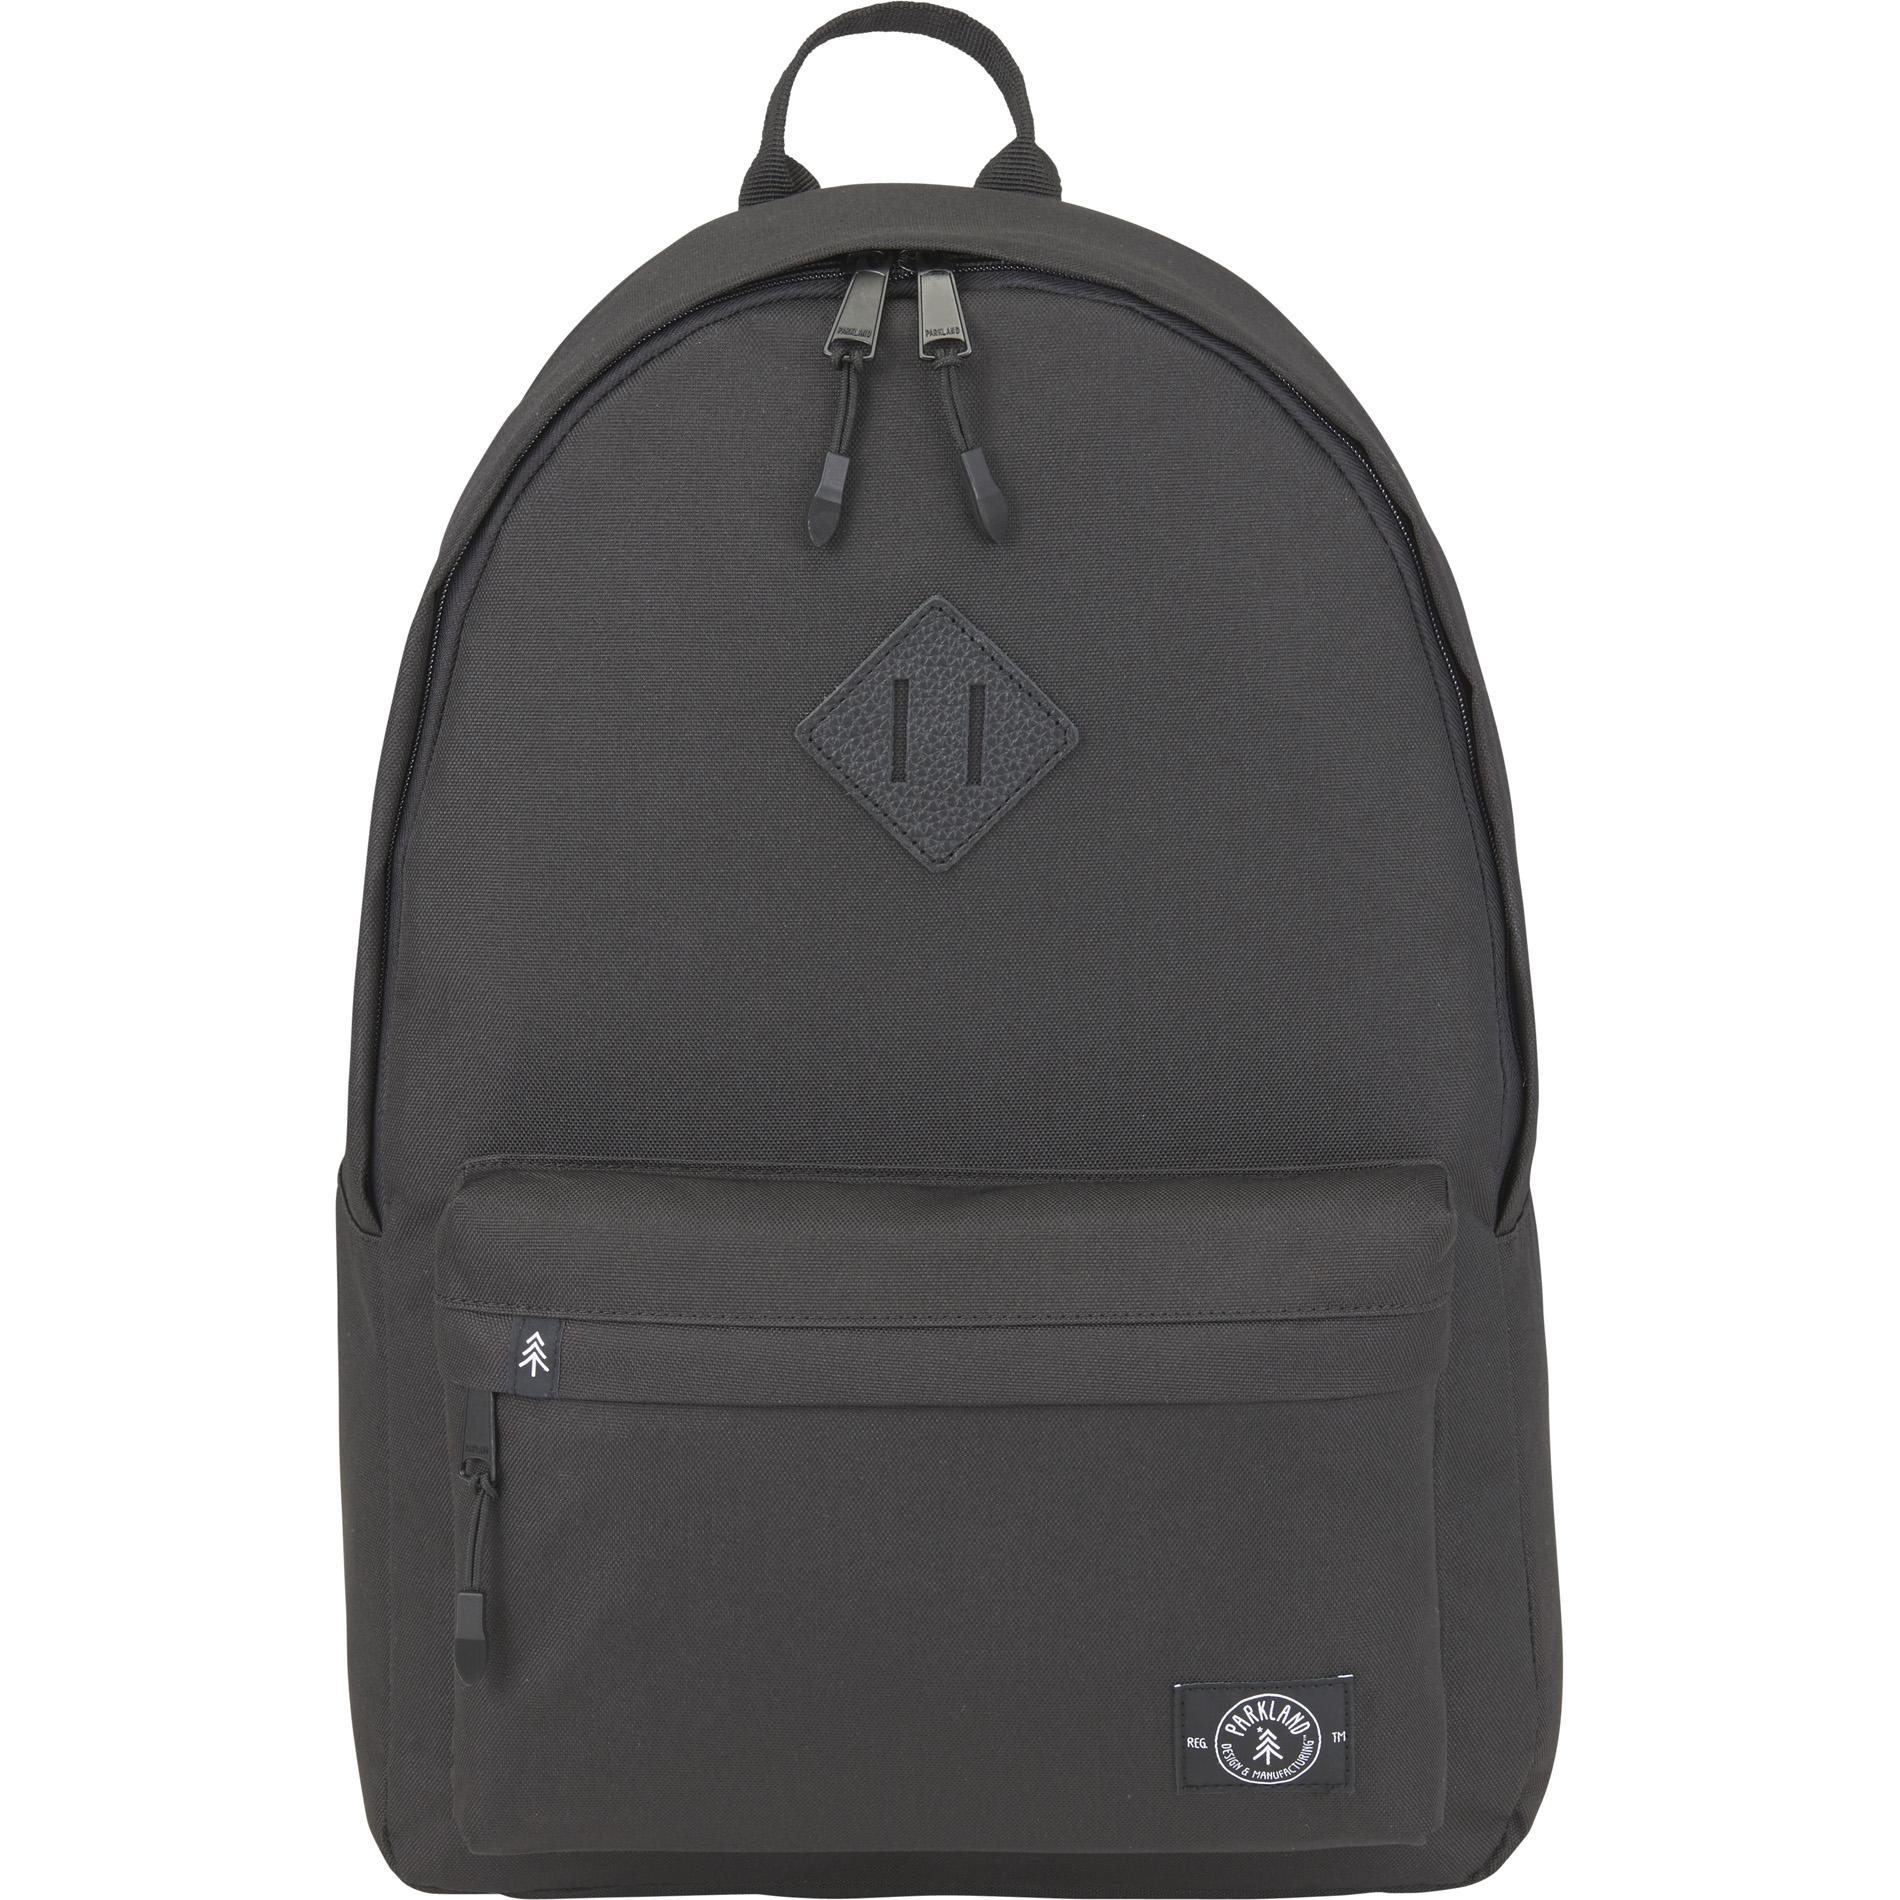 Parkland 7275-10 - Kingston Backpack